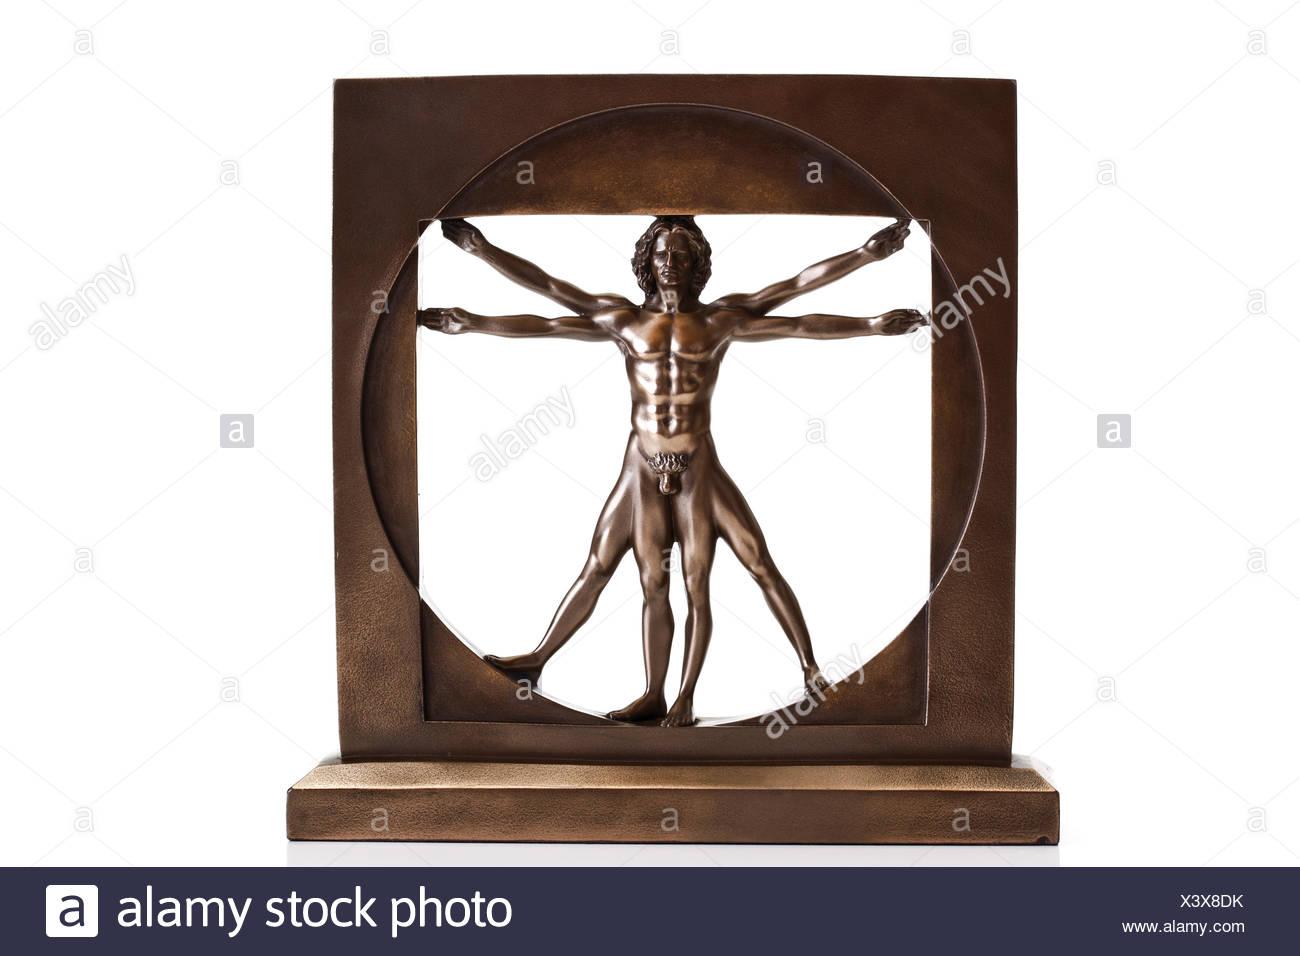 Vitruvian Man By Leonardo Da Vinci Stockfotos & Vitruvian Man By ...